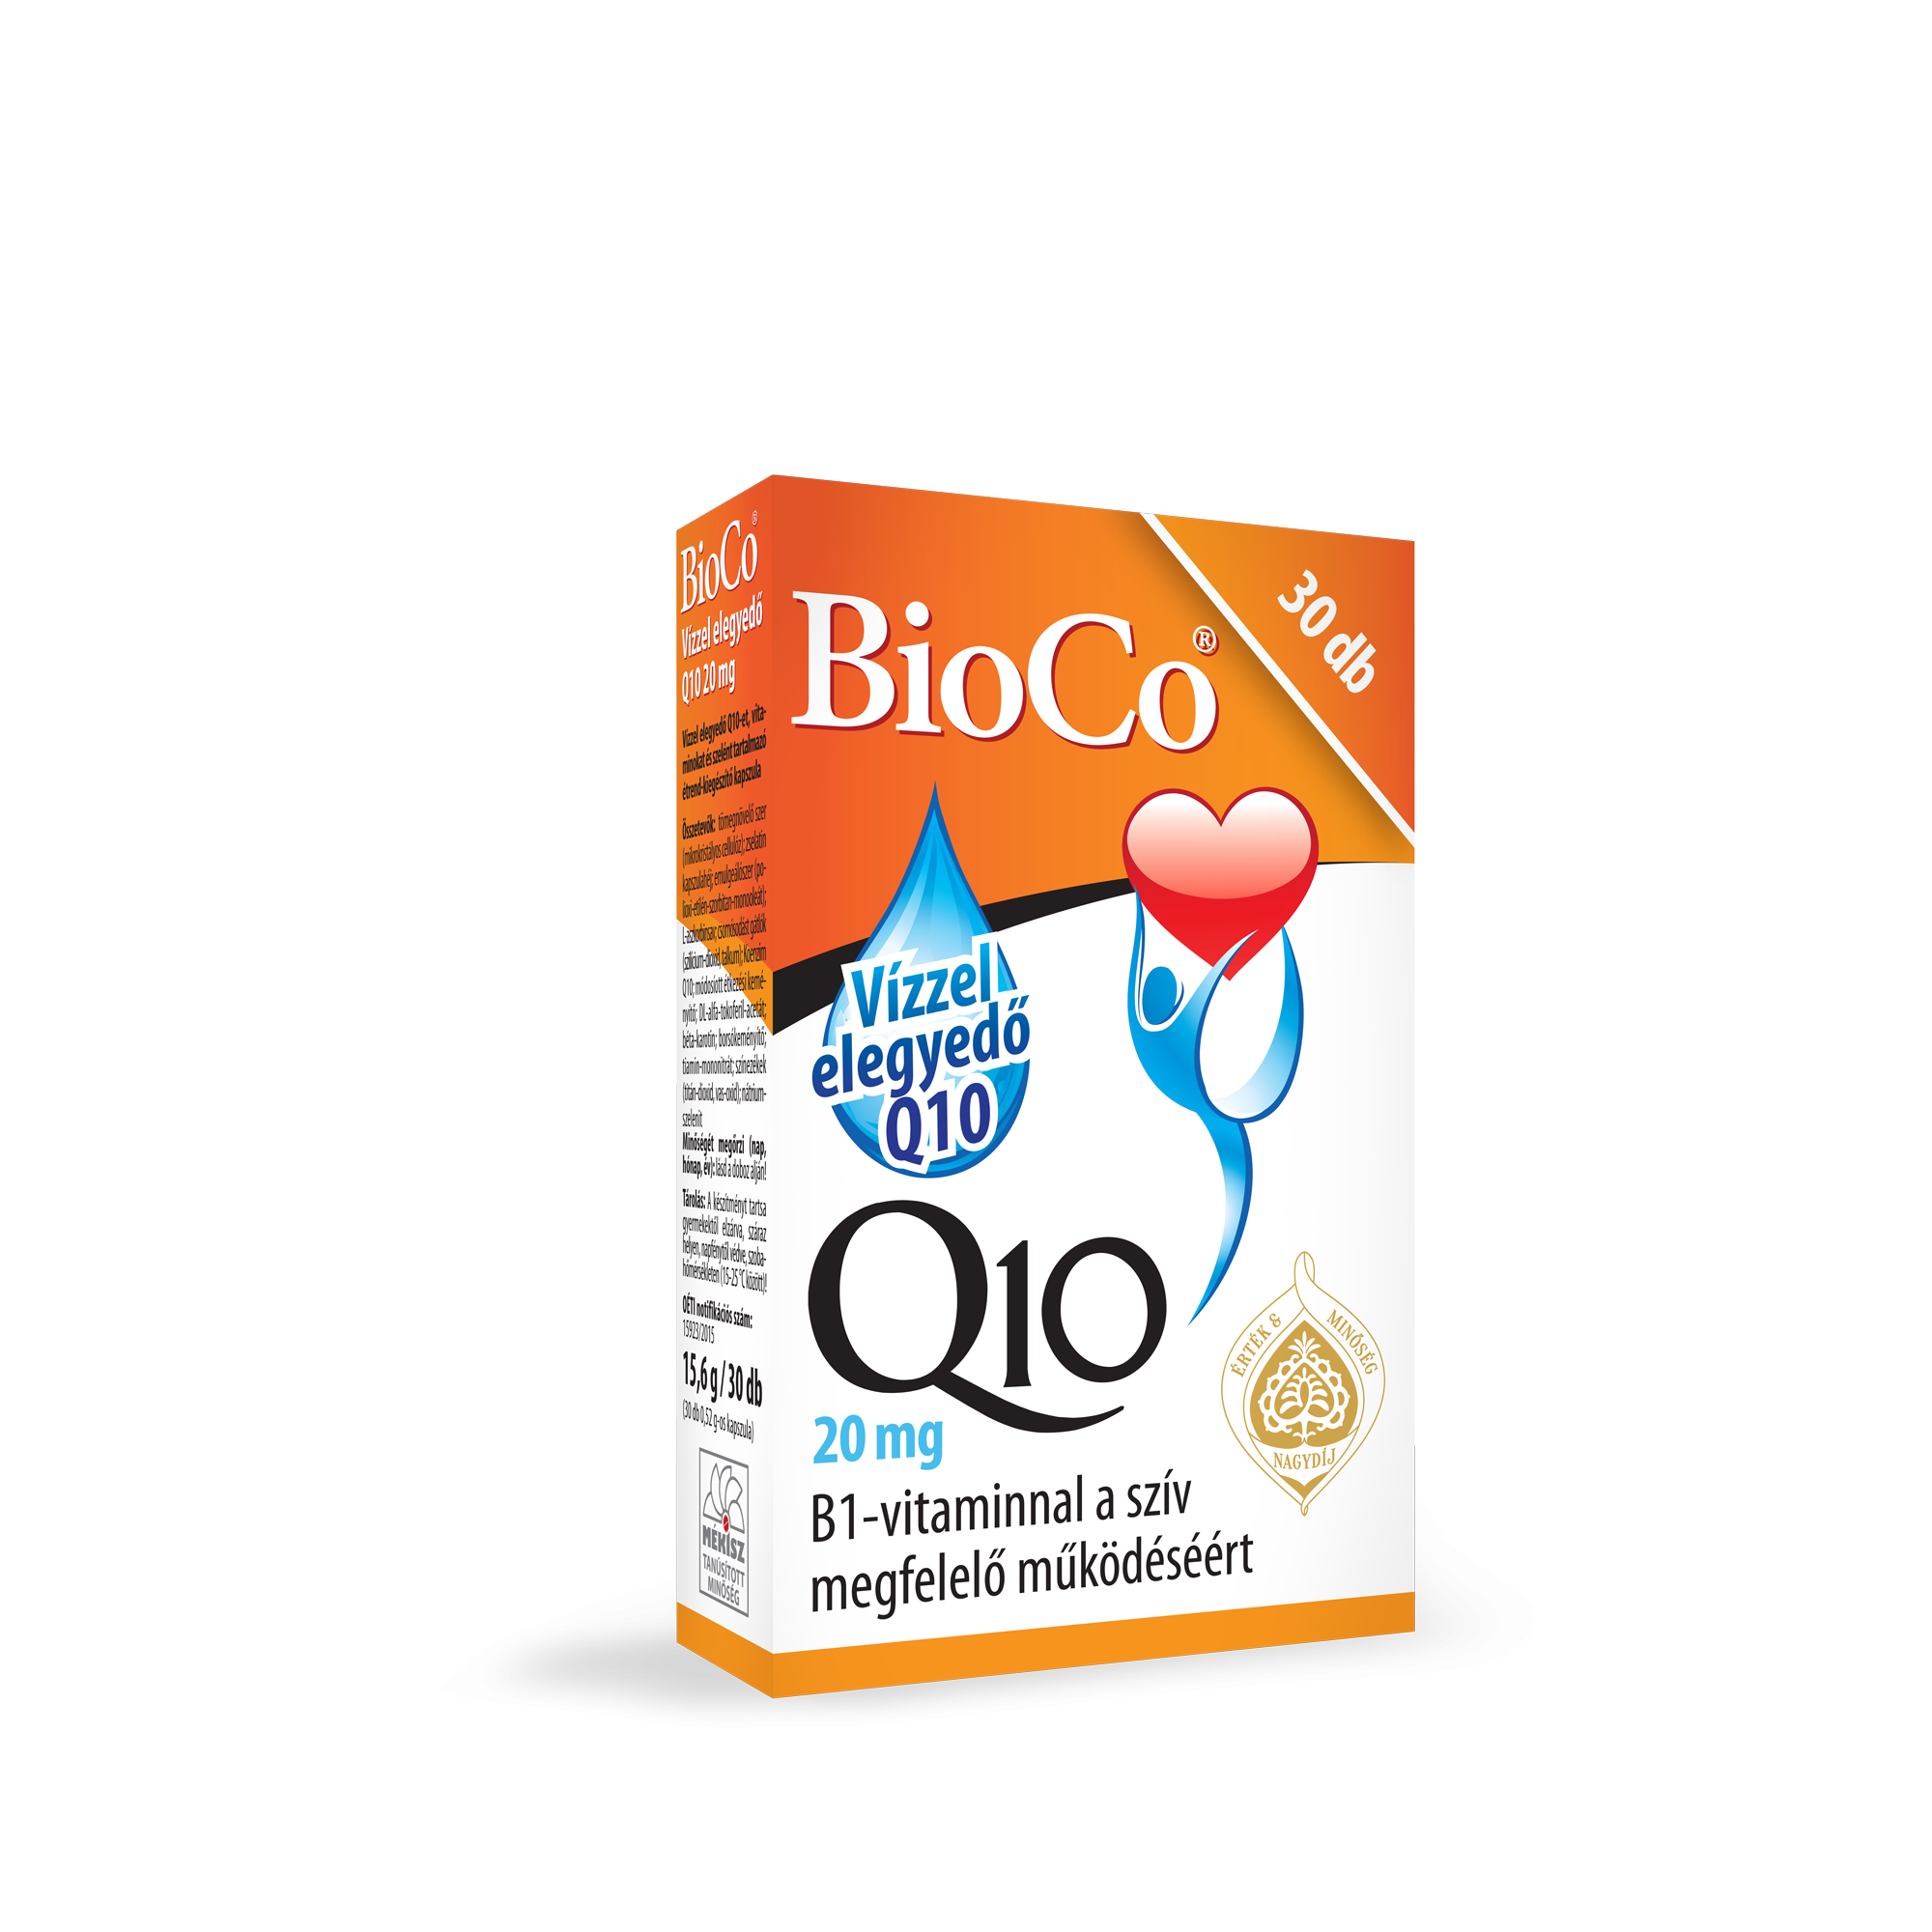 BioCo Q10 20 mg transzport emulziós kapszula 30x